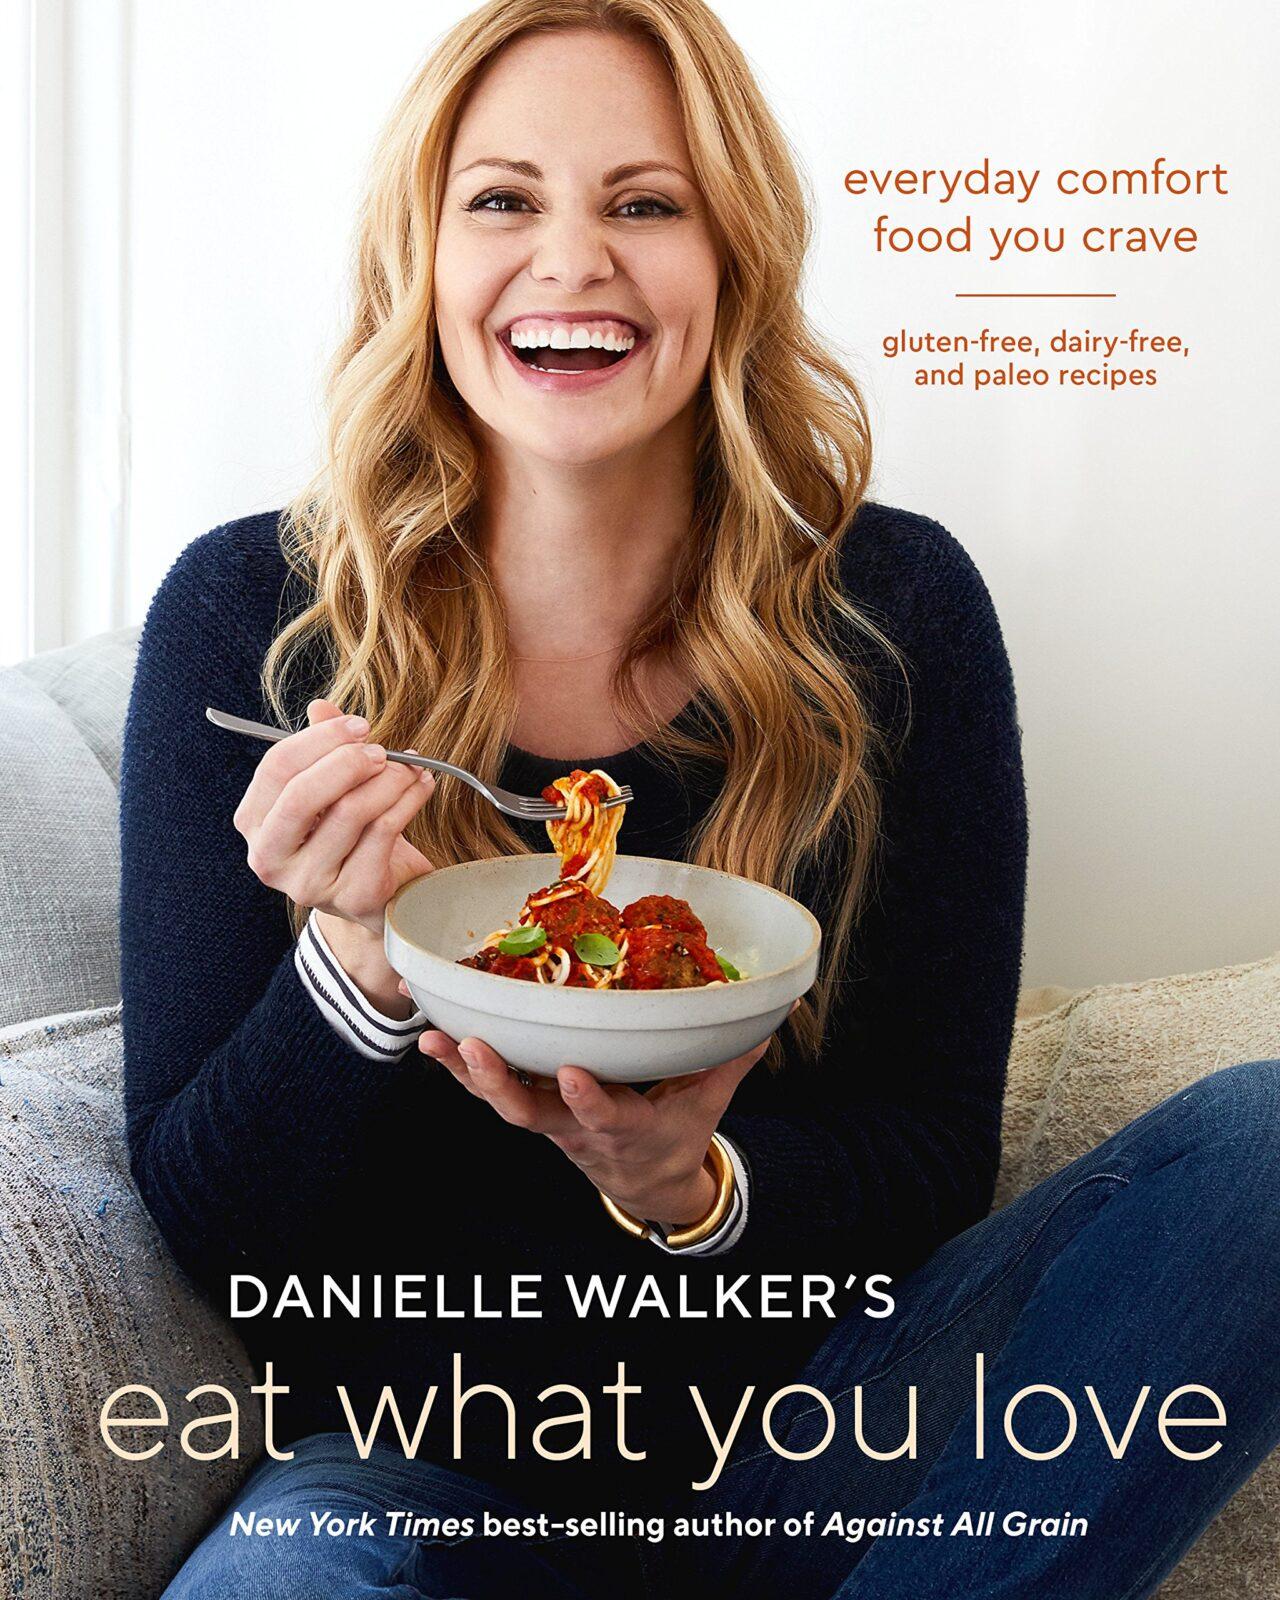 Eat What You Love Danielle Walker edit seven healthy cookbooks 2019 january